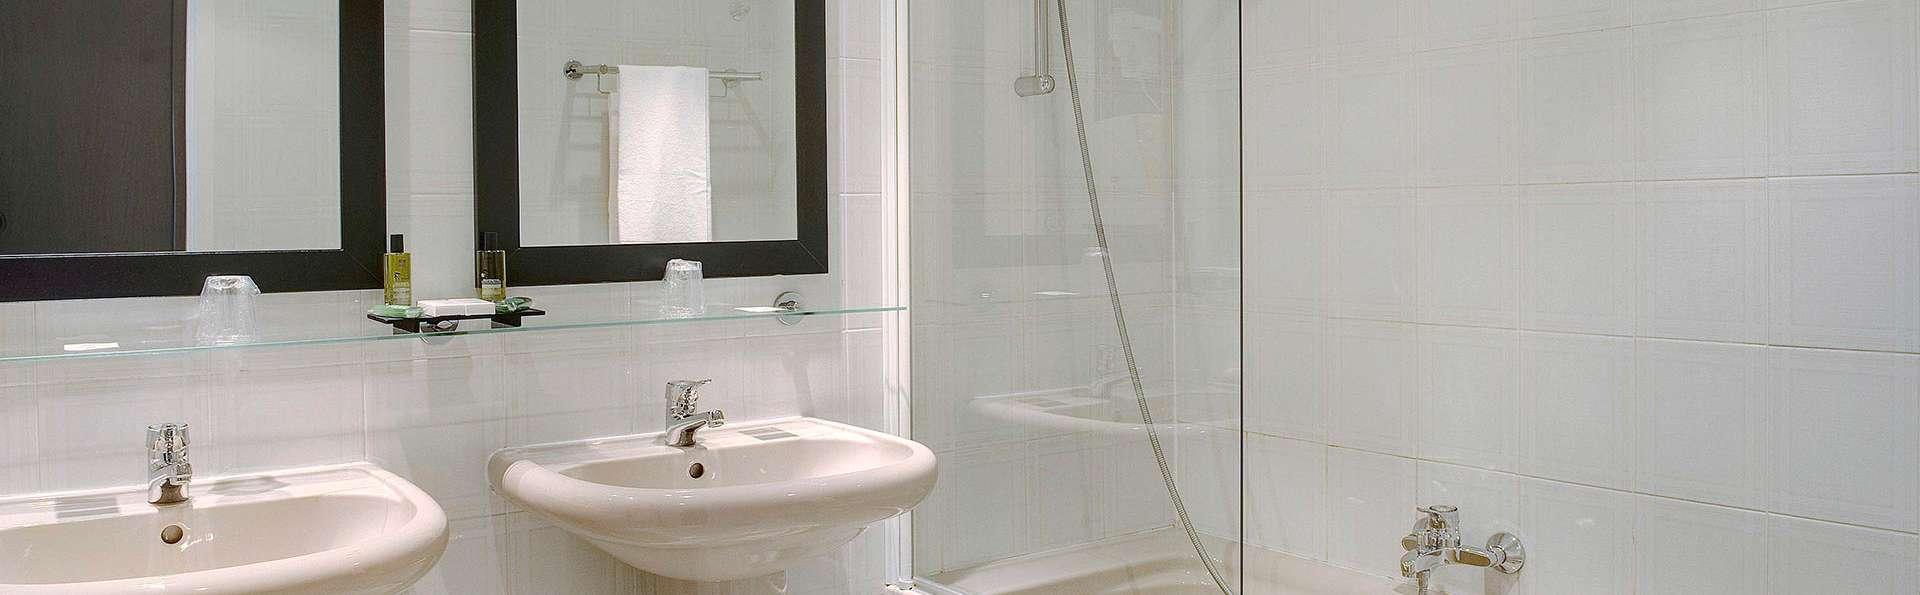 Domaine de Saint- Clair - edit_bathroom.jpg